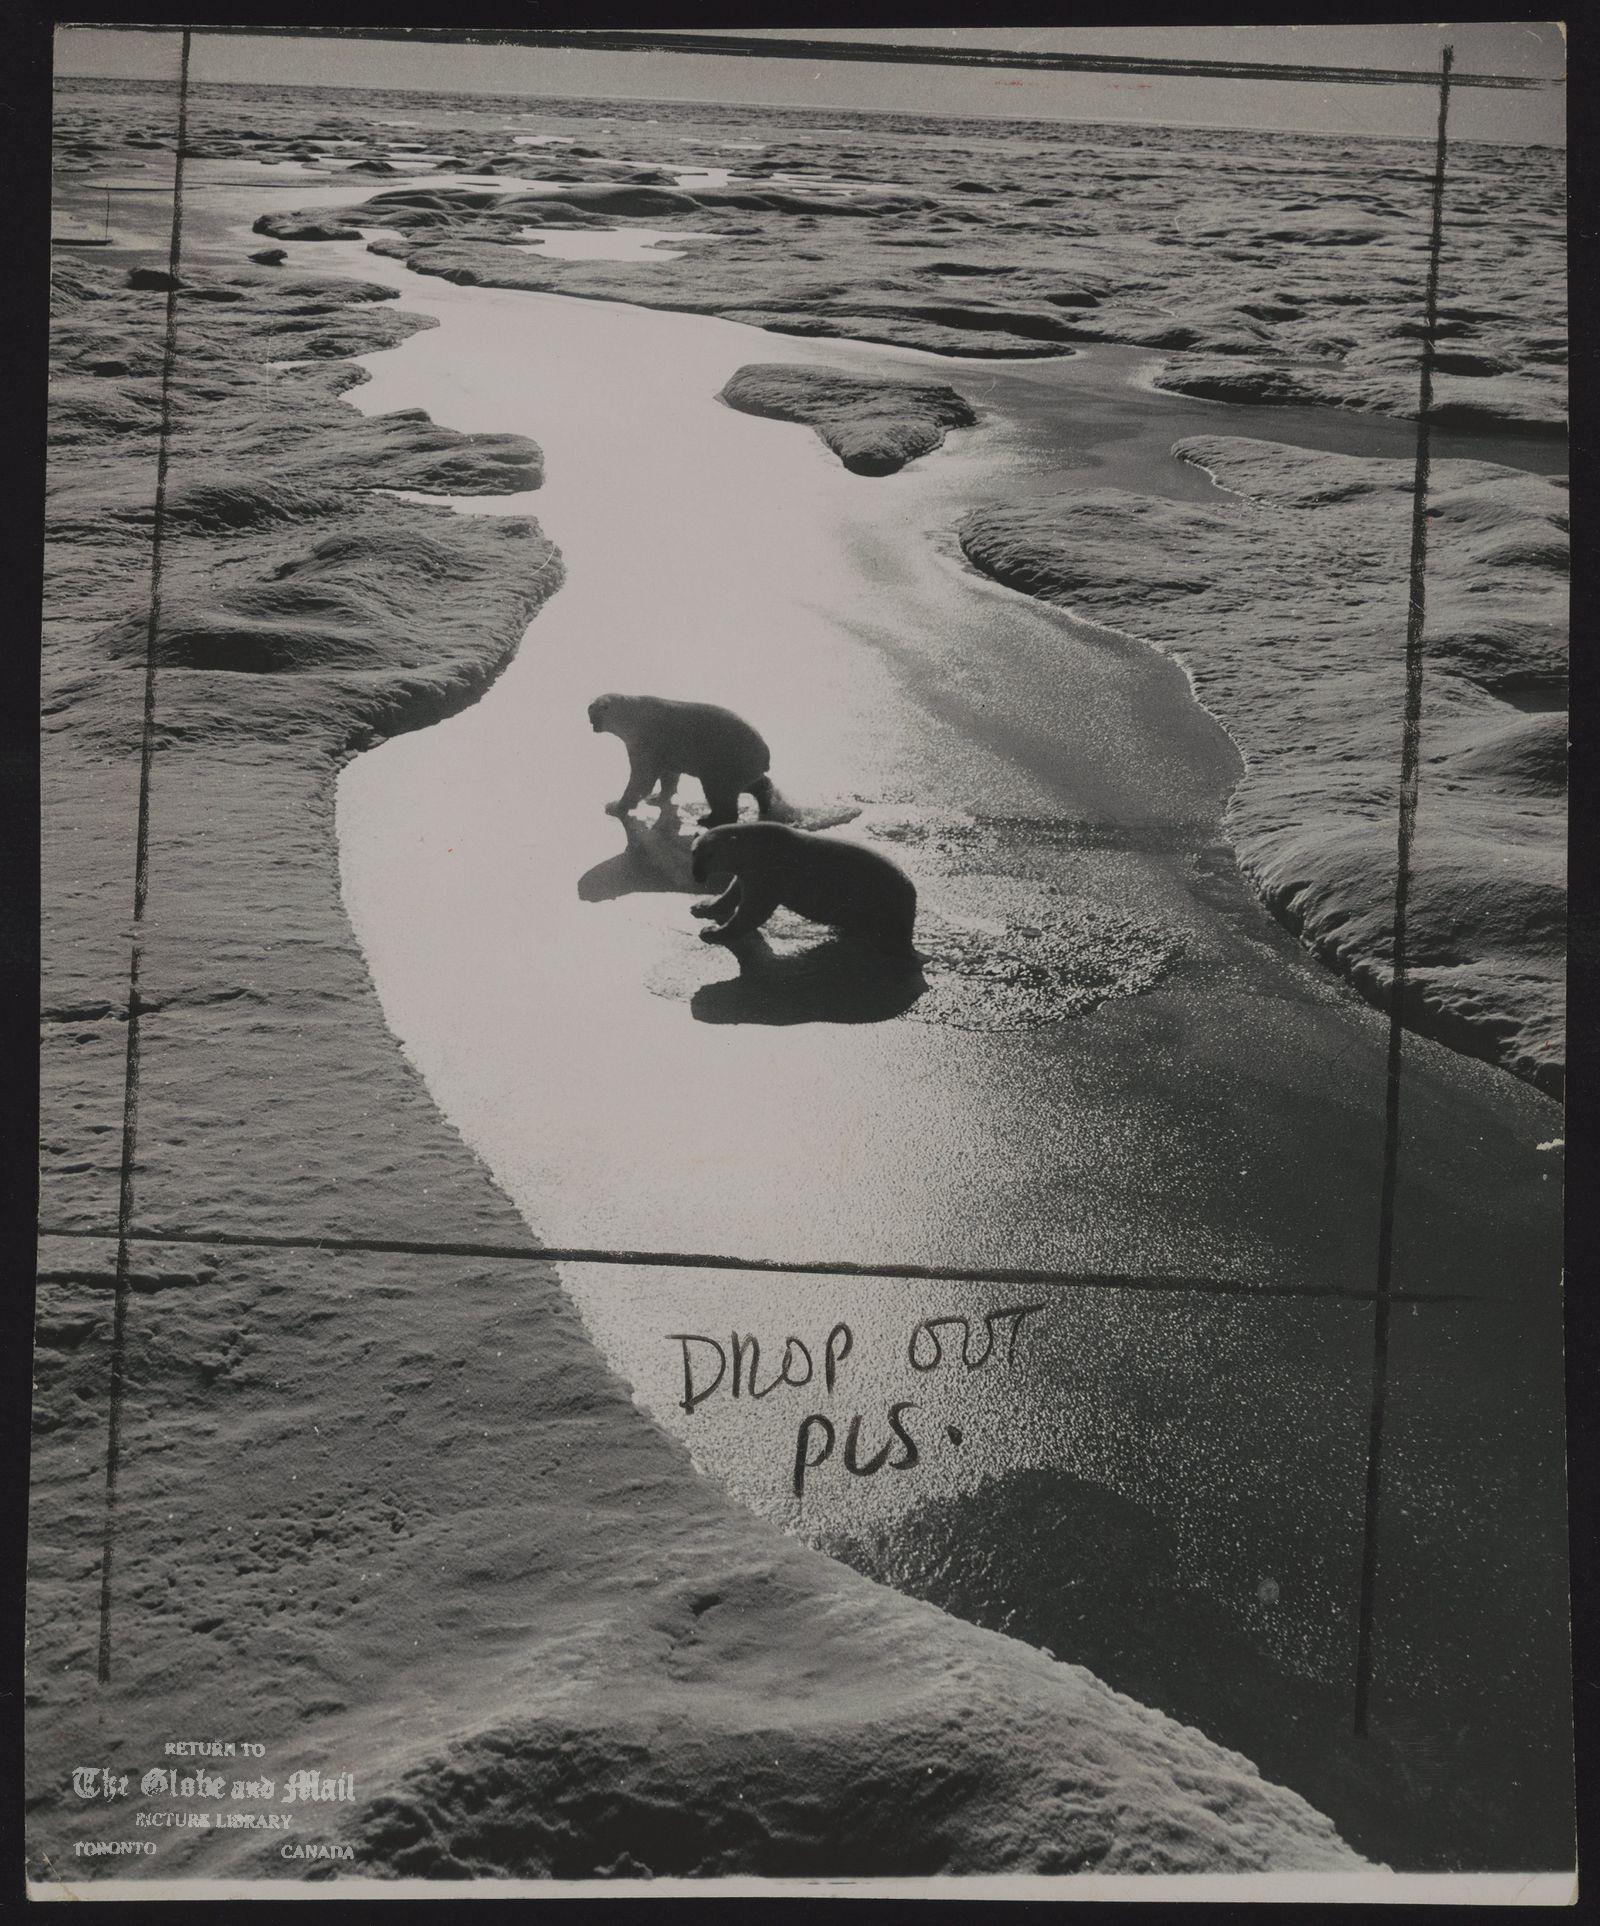 POLAR BEARS In the Arctic.